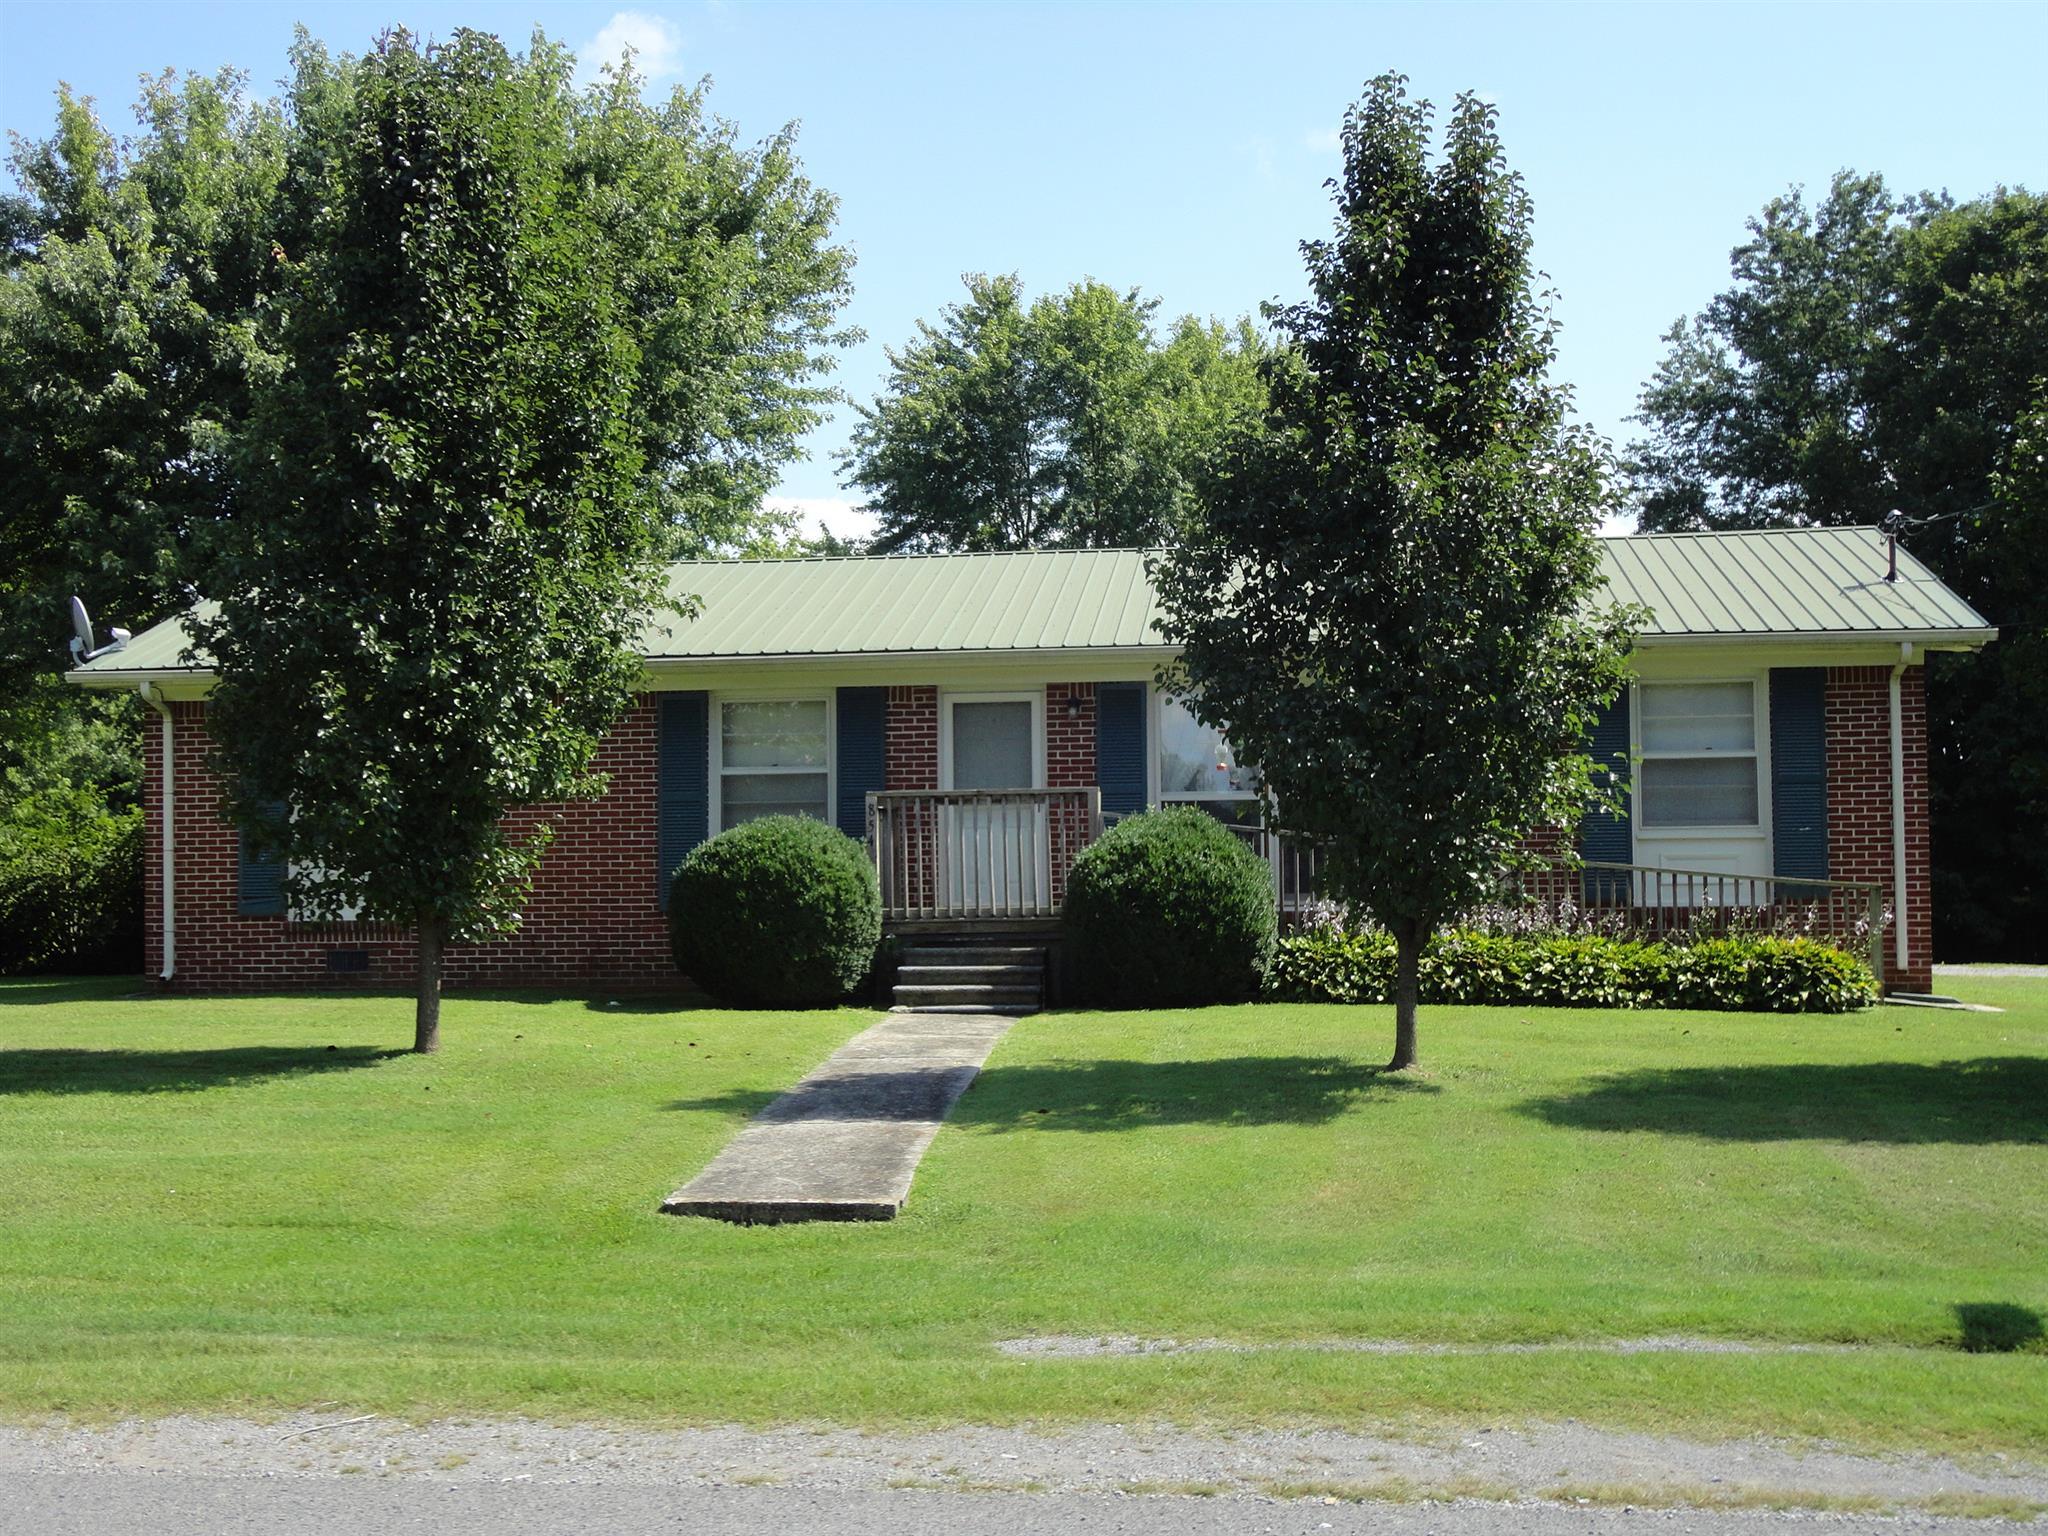 854 Driver St, Smithville, TN 37166